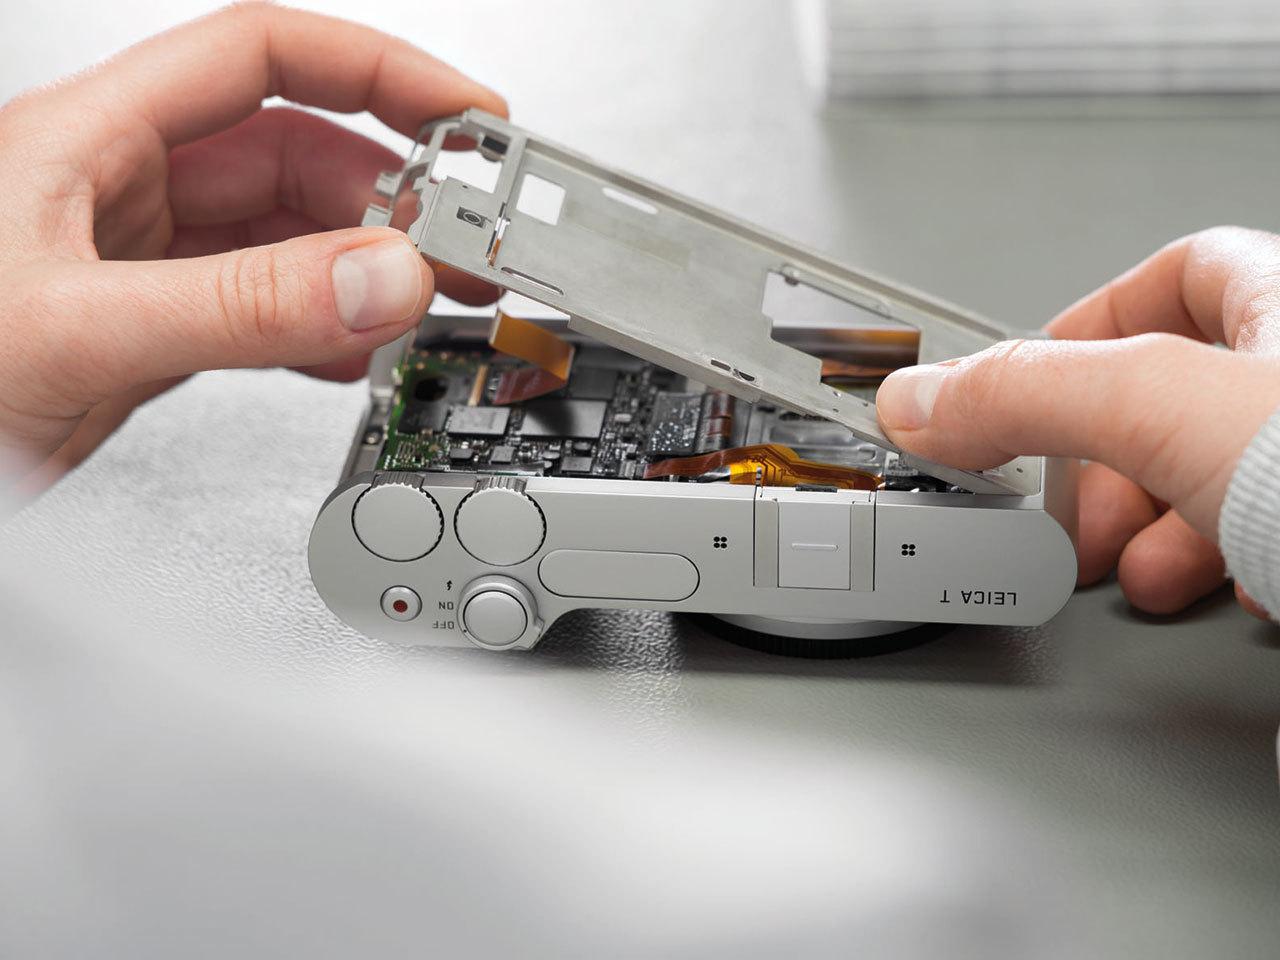 Установка фирменного логотипа Leica:: https://tech.onliner.by/2014/04/25/leica-t